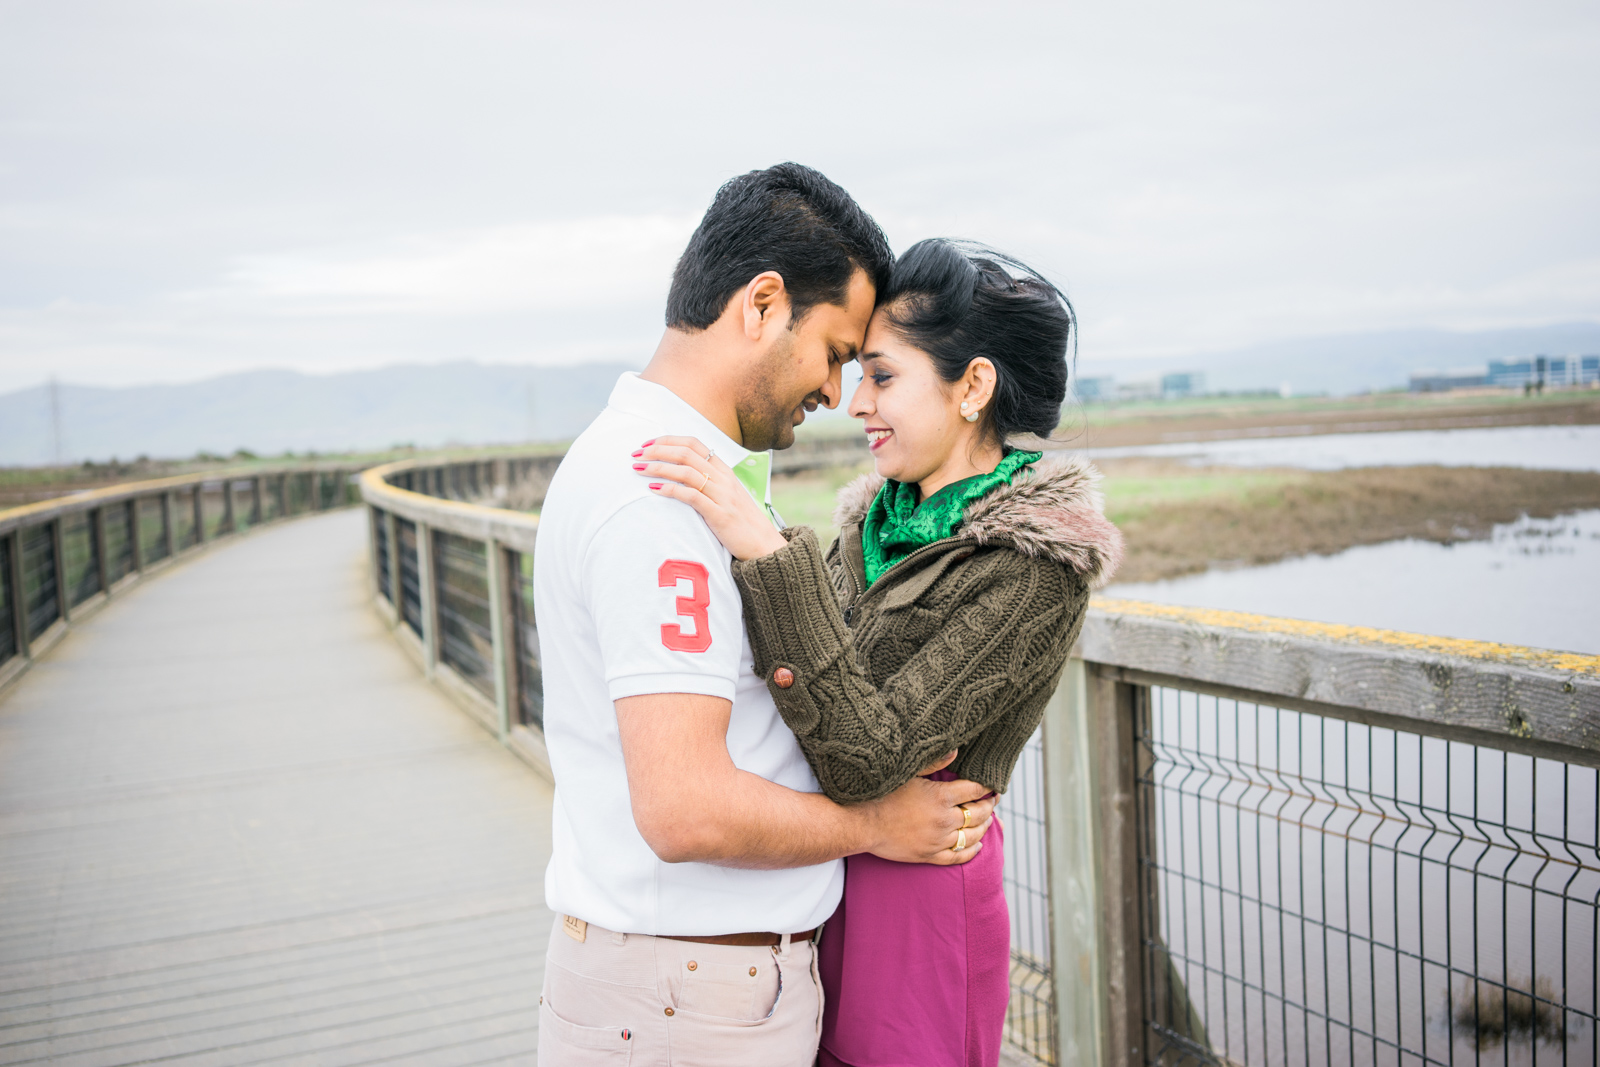 Baylands-park-valentines-day-couples-engagement-lifestyle-photography-sunnyvale-afewgoodclicks.net-83.jpg